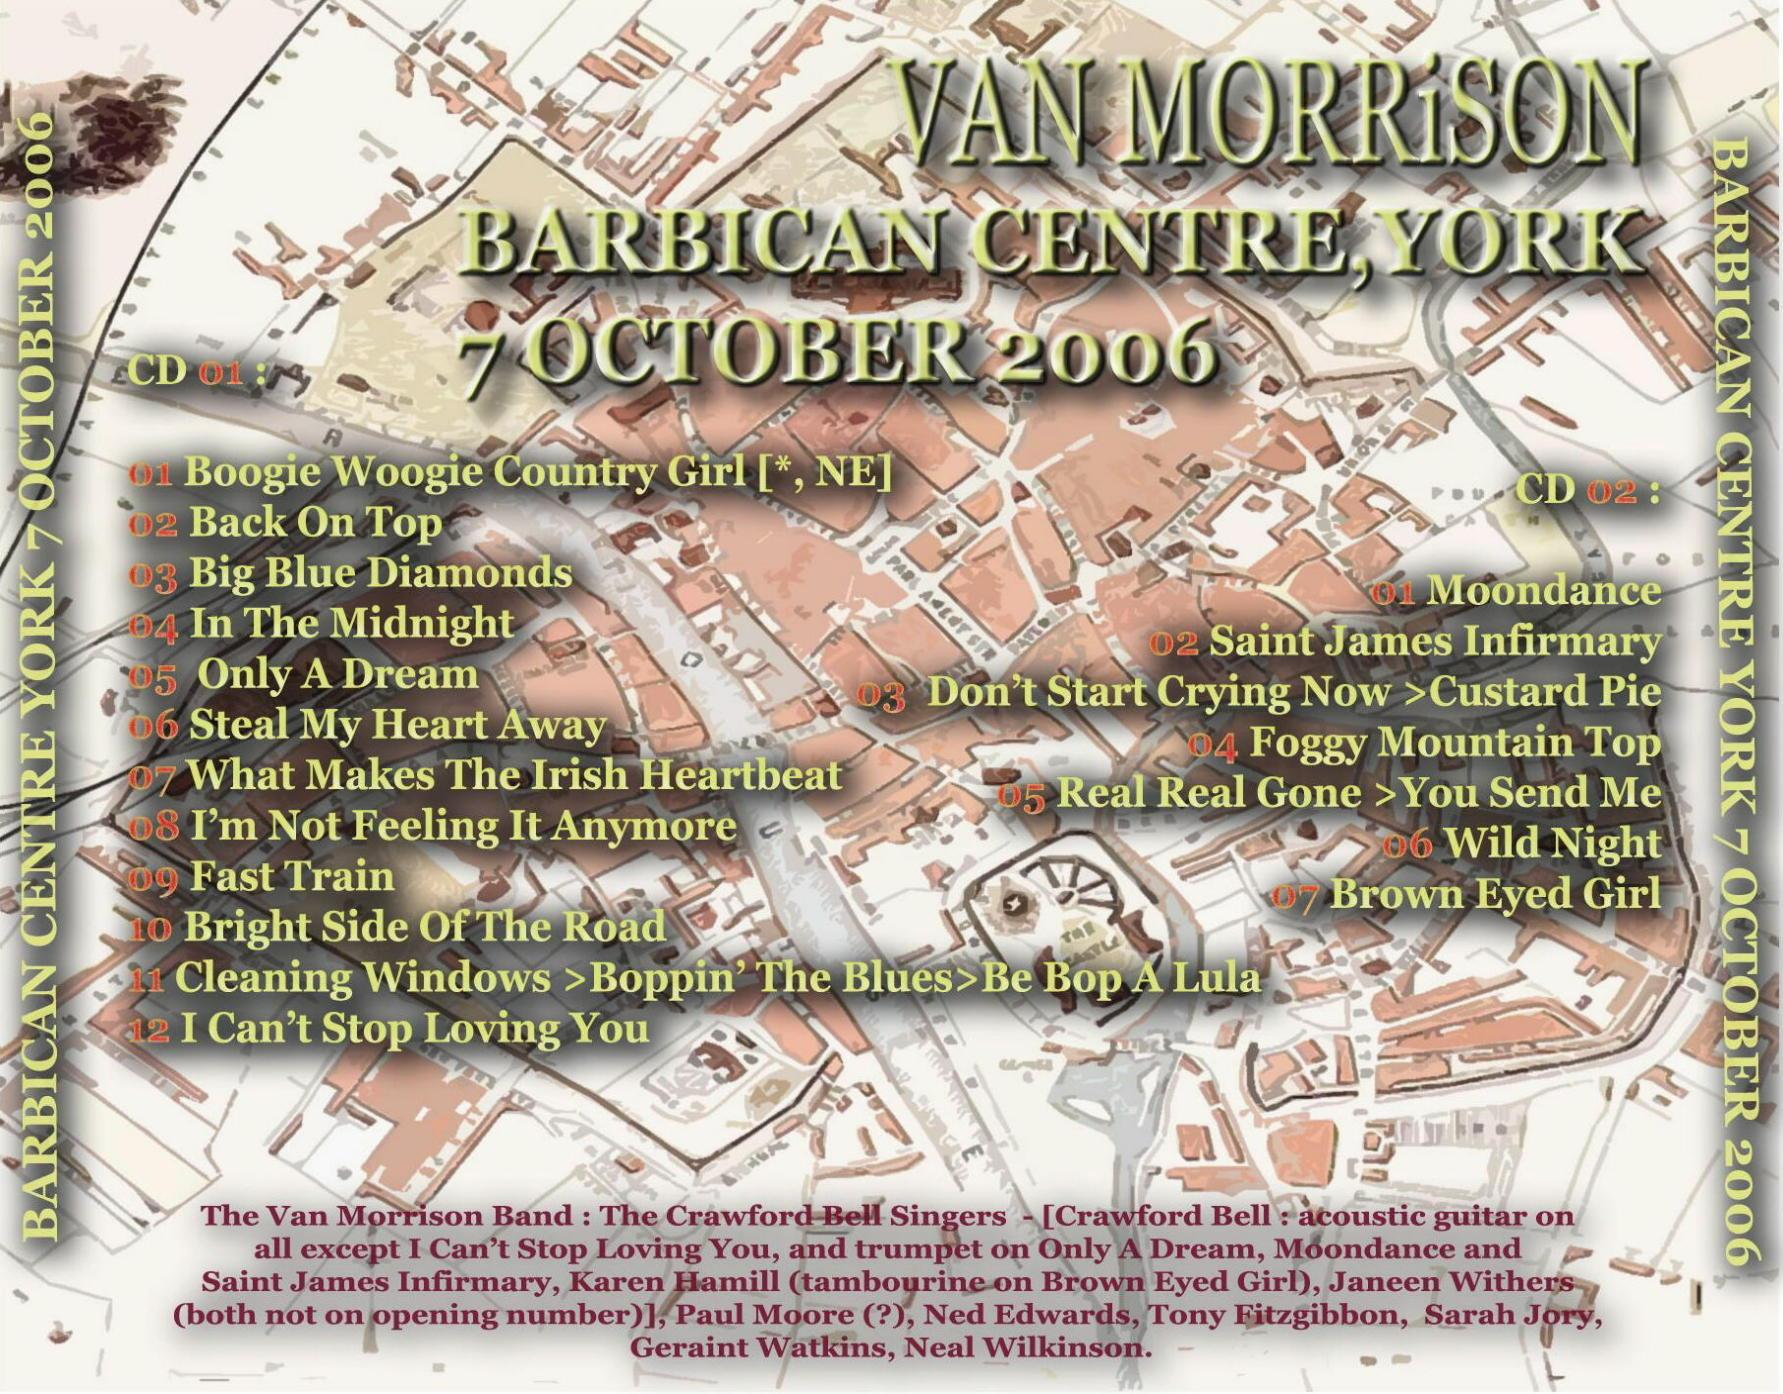 VanMorrison2006-10-07BarbicanCentreYorkUK2.jpg